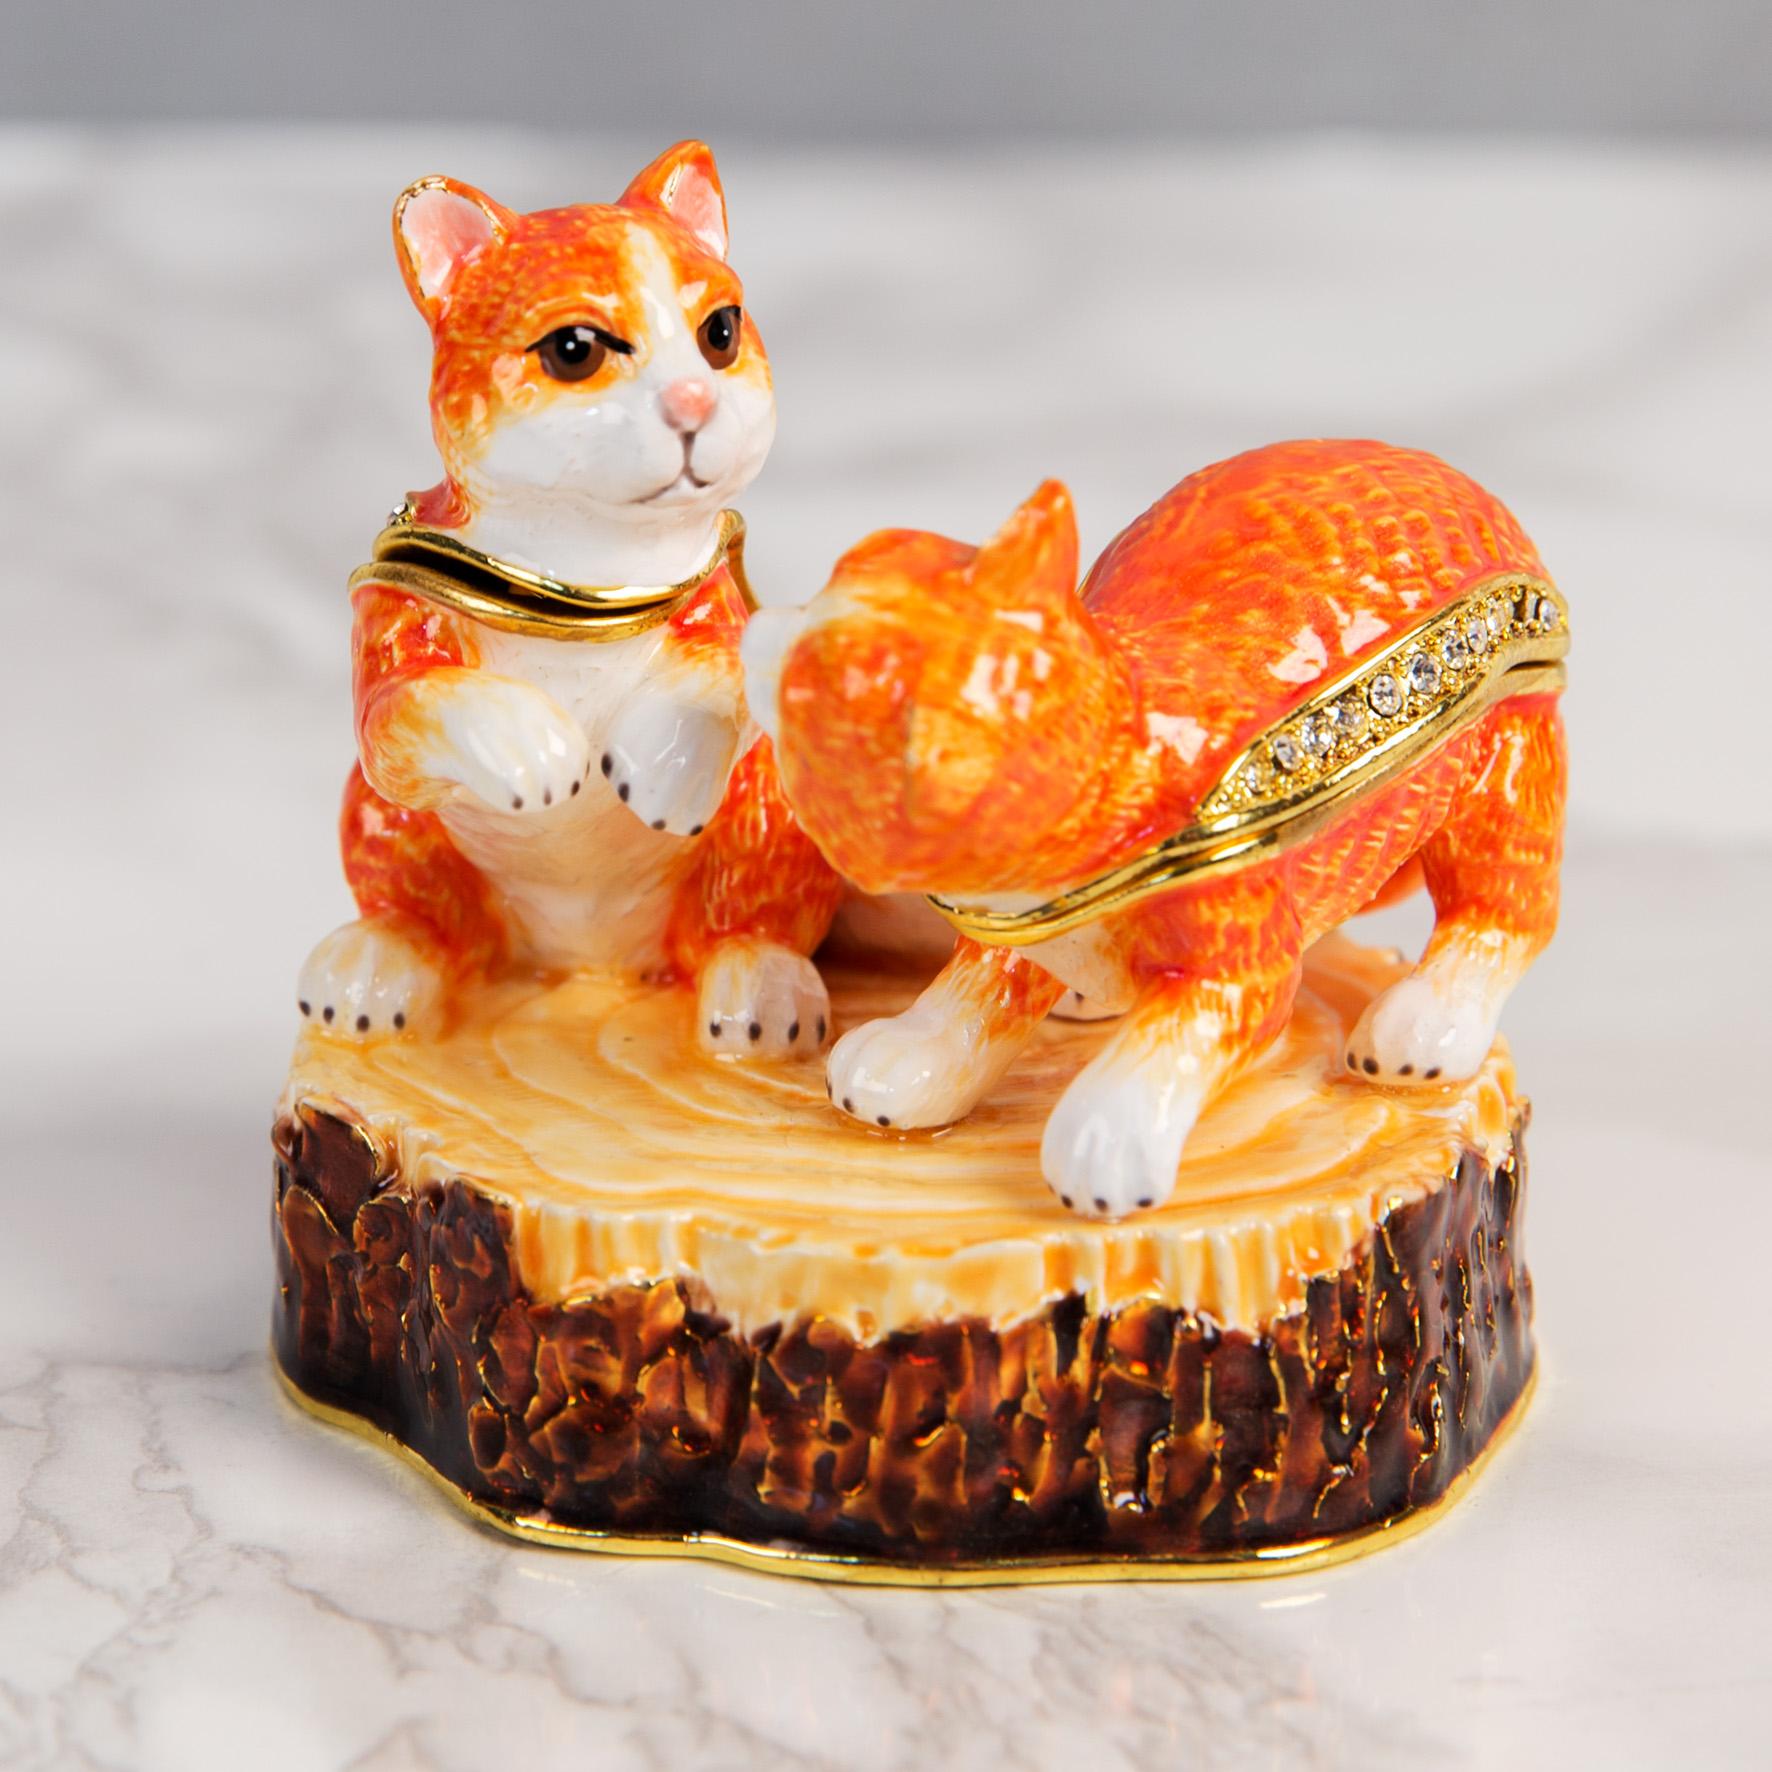 Squirrels on a Log Trinket Keepsake Box Ornament Figurine